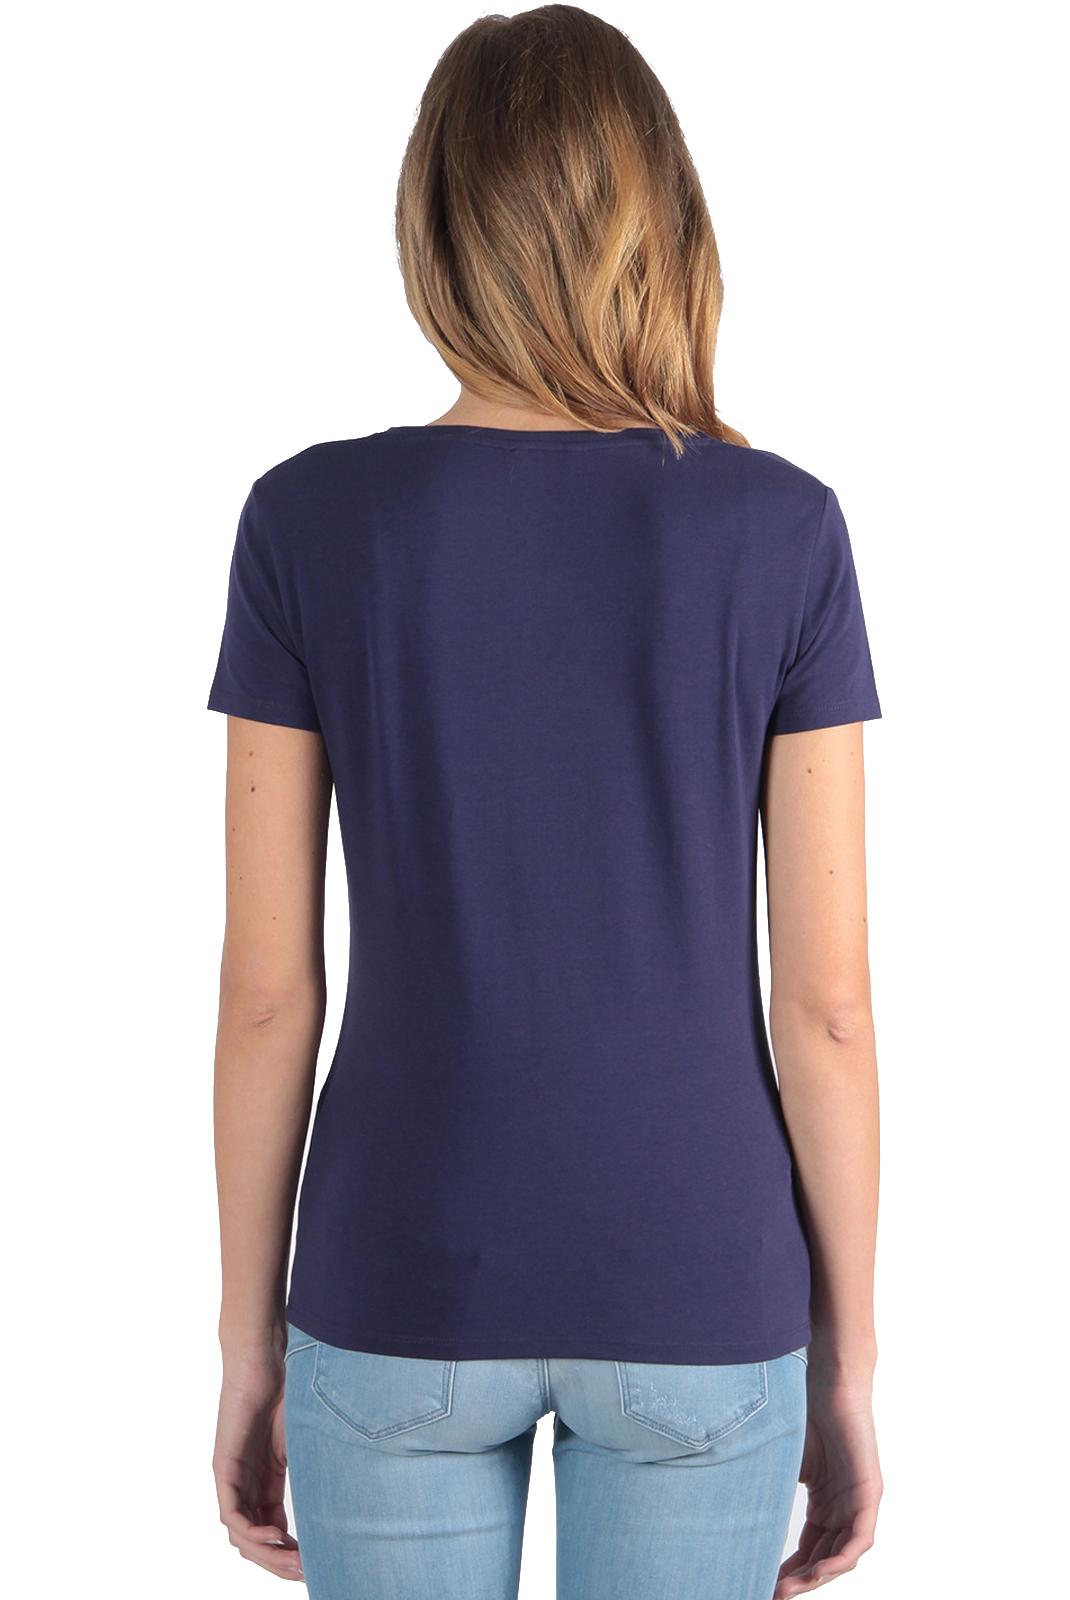 Tee shirt  Kaporal BUXOM OUTREMER